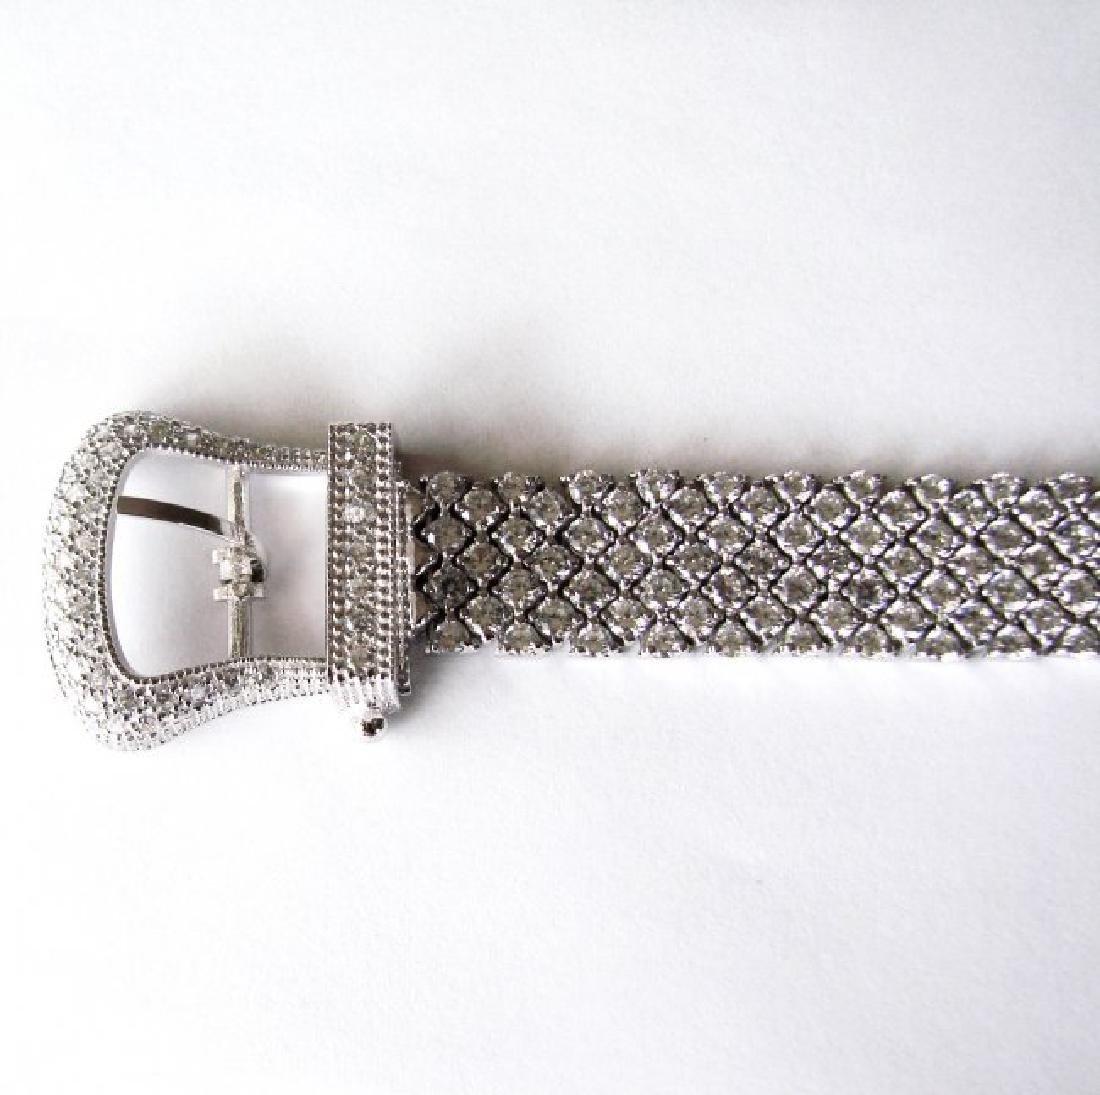 Bracelet Creation Diamond 47.91Ct 18k W/g Overlay - 7